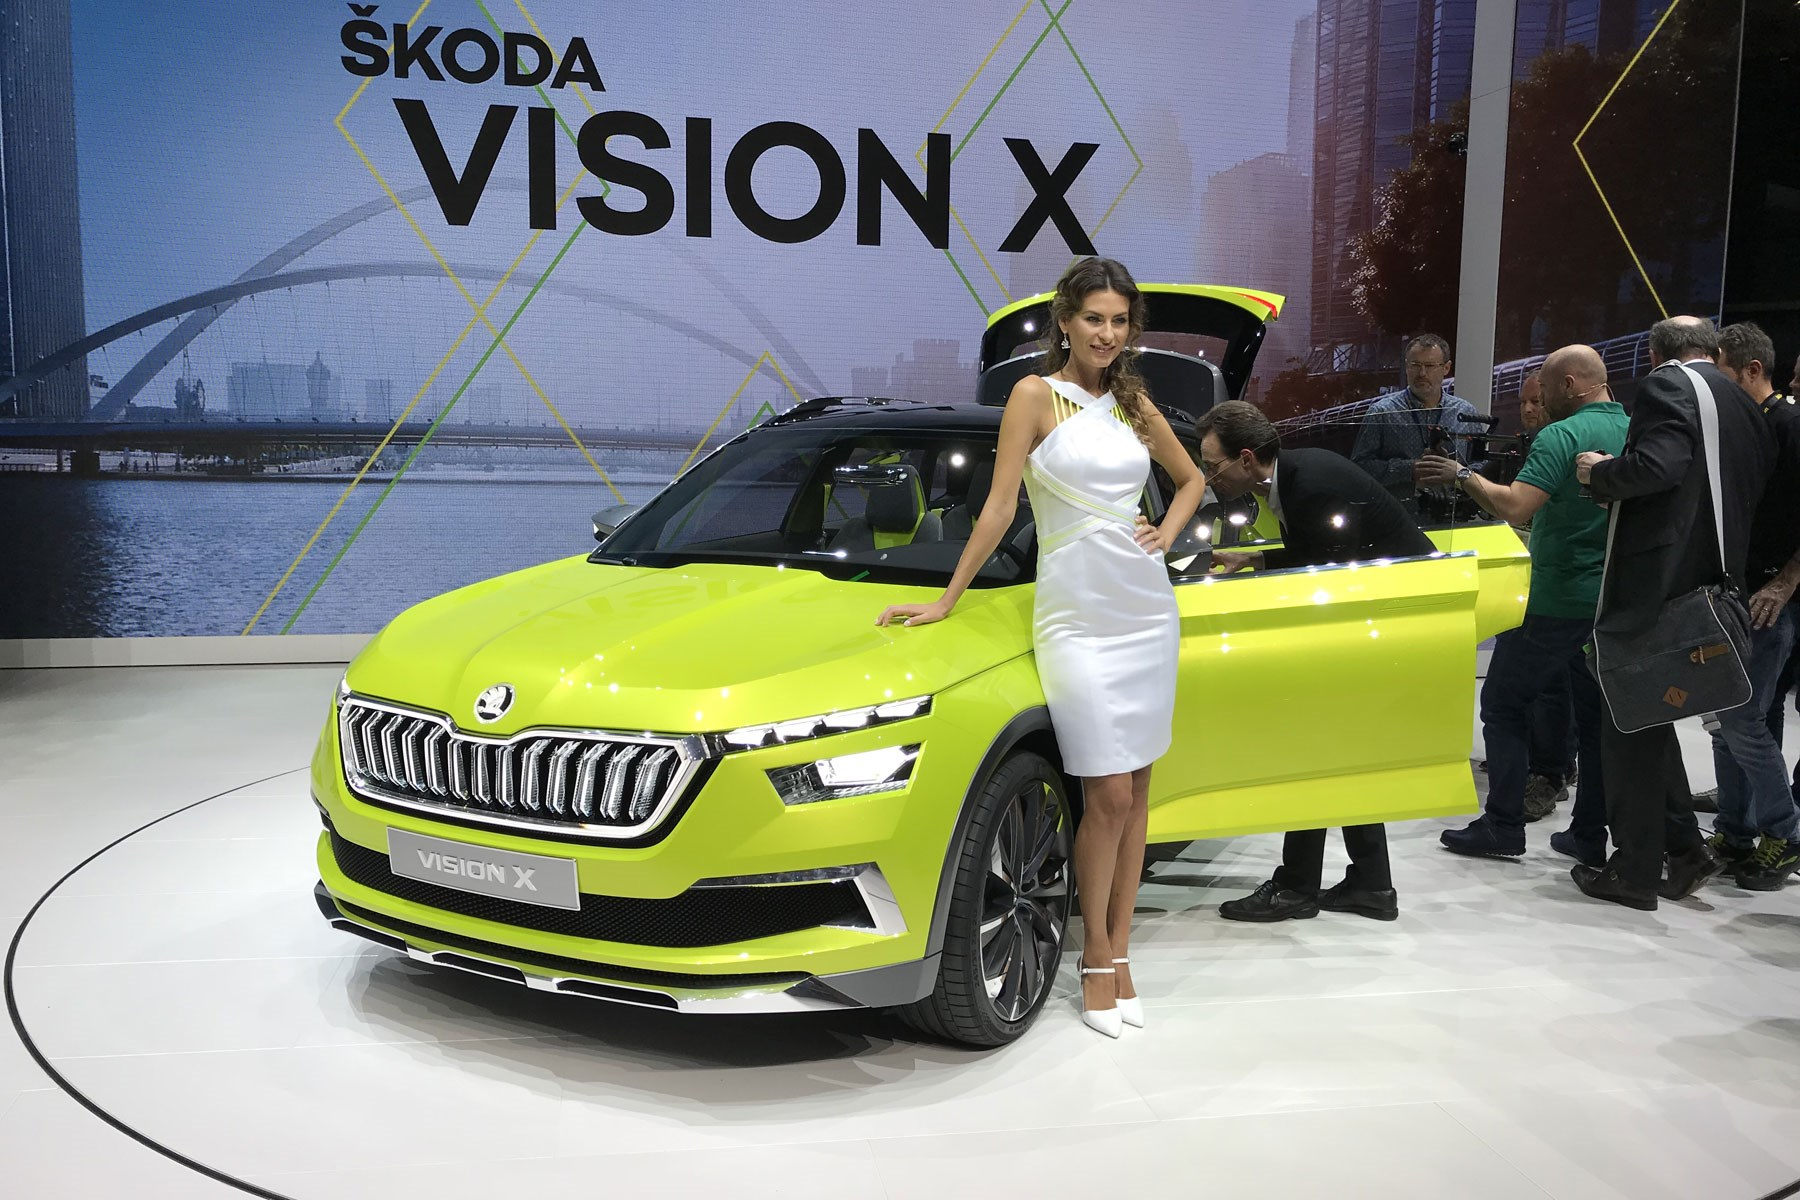 Skoda Vision X Concept Suv Pics Specs And Details Car